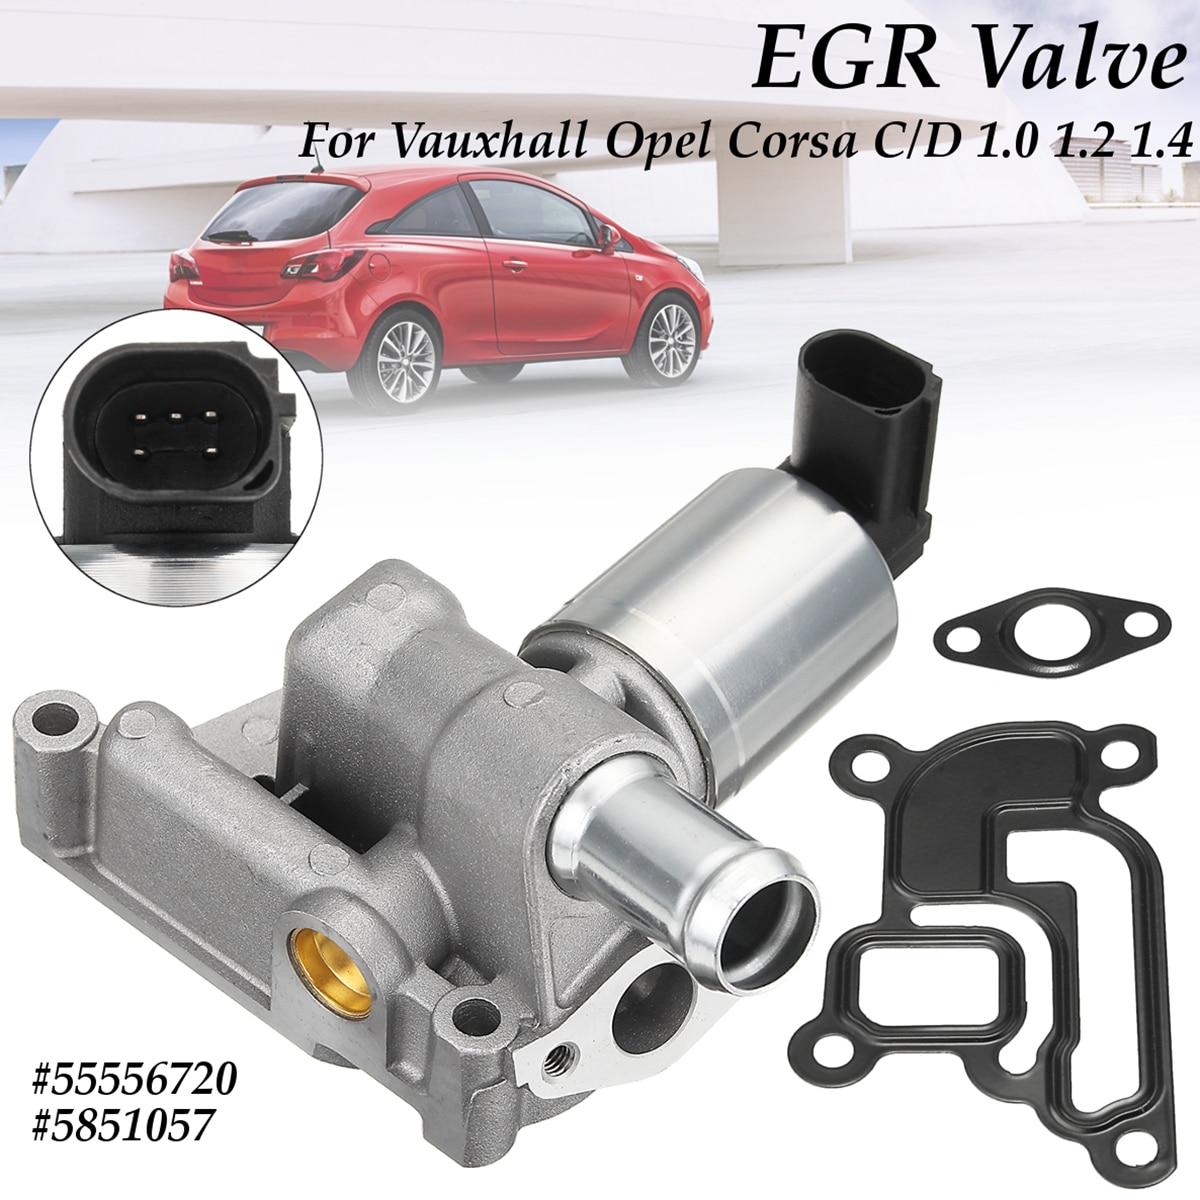 цена на 5 Pins EGR Exhaust Valve for Vauxhall?Opel?Corsa?D?2006-2015 for Corsa C?2003-2015 1.0 1.2 1.4 #55556720 New